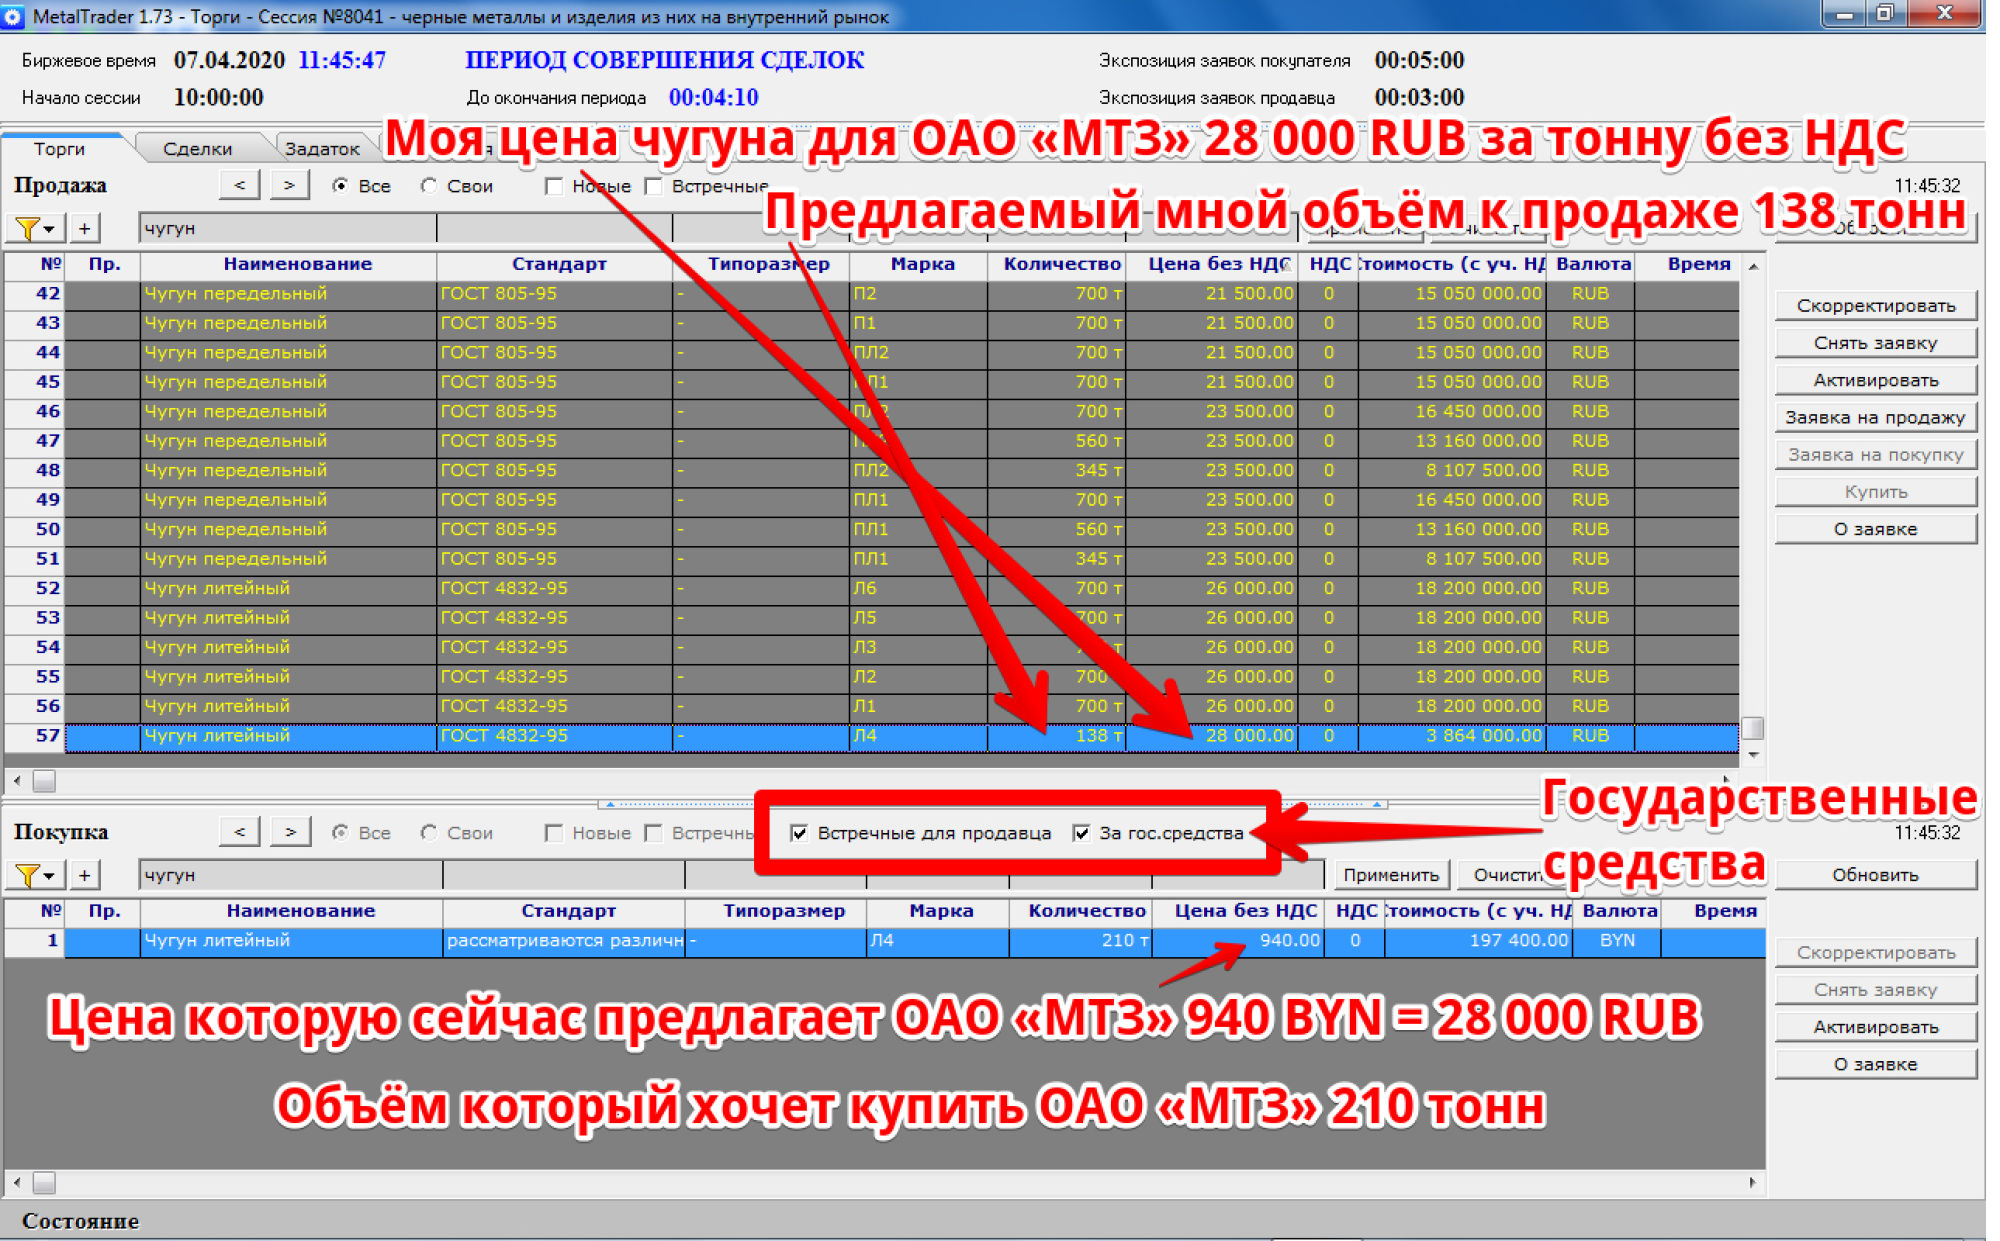 image_52efd57da90434ce8bcd32f63426d7d1.jpeg